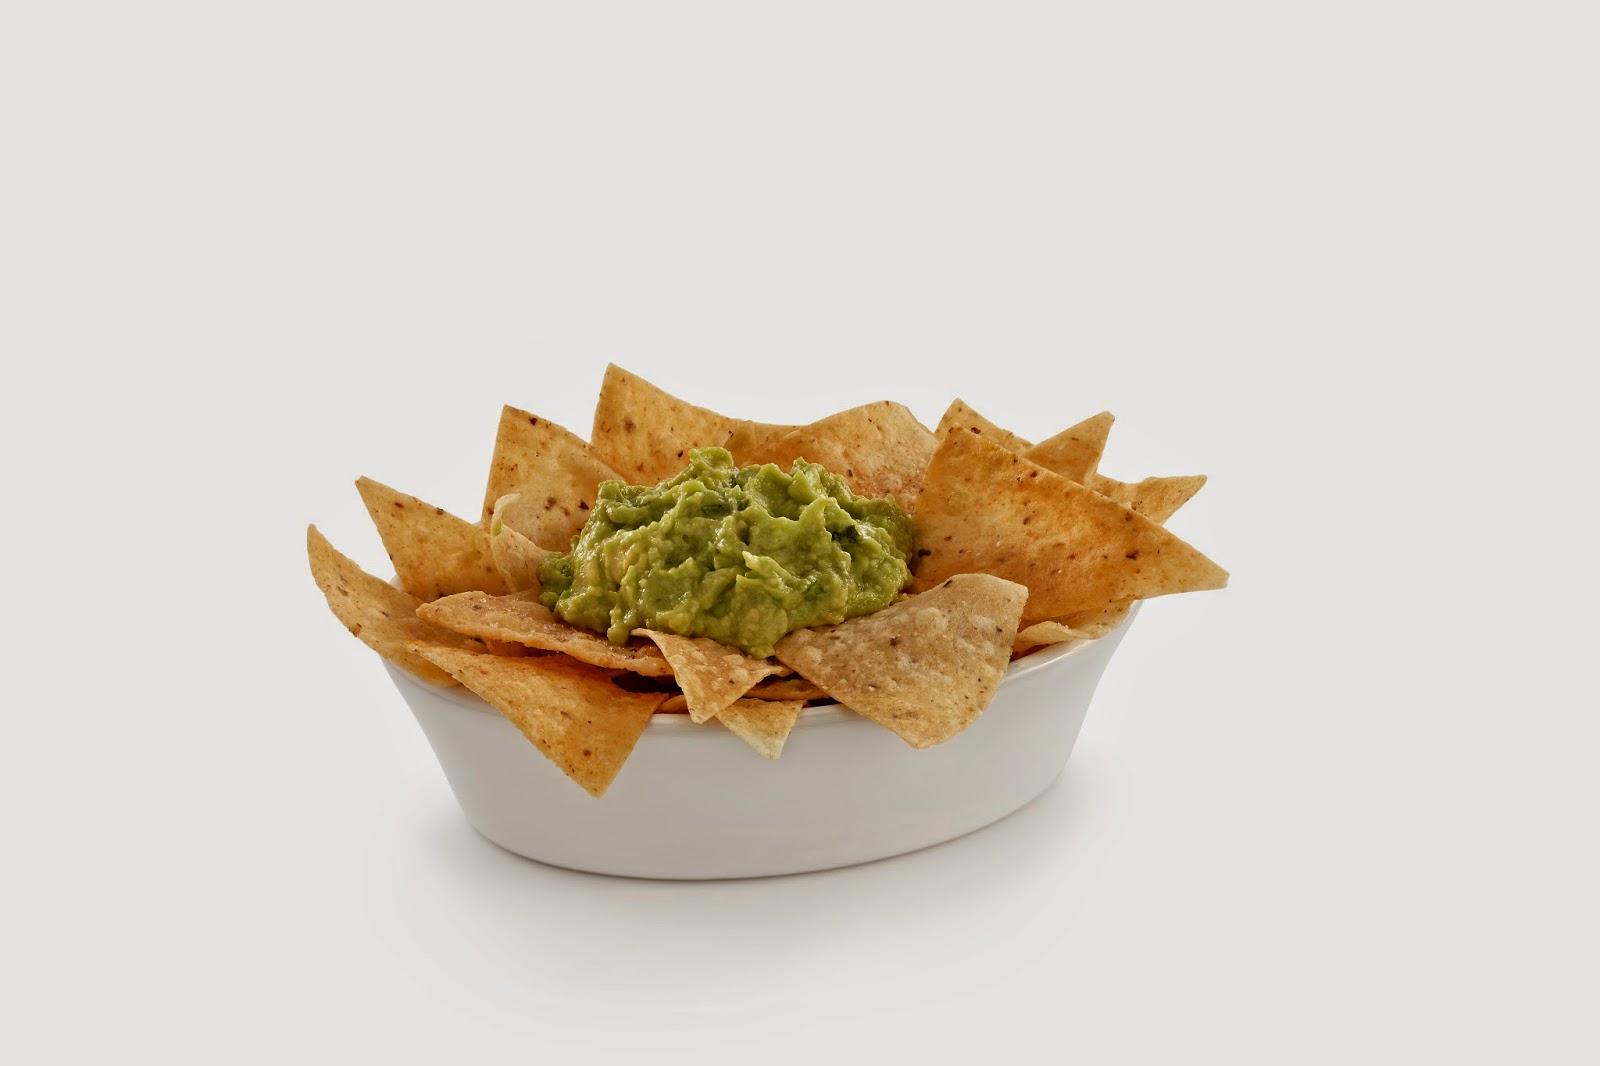 Chip n diego